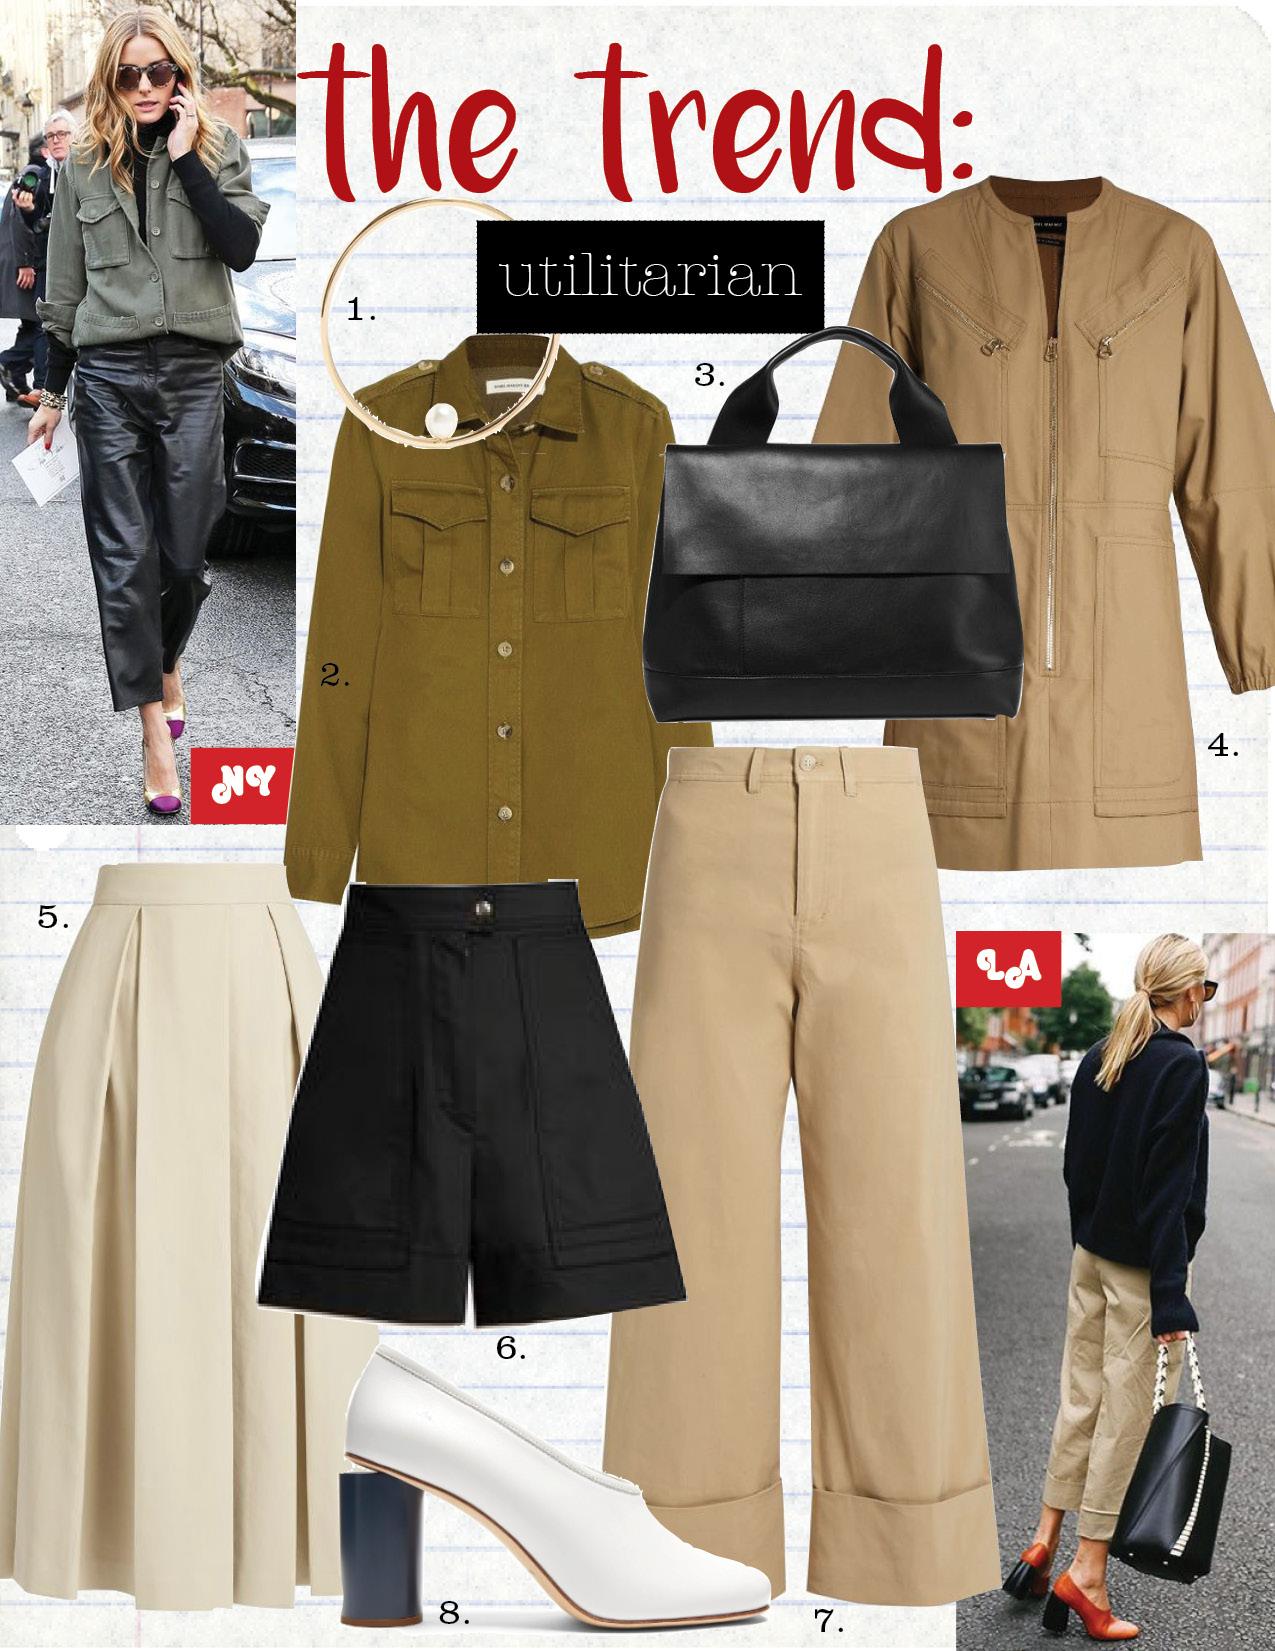 1. anissa kermiche pearl&yellow-gold earring, $617,  matchesfashion.com  2. etoile isabel marant obrian cotton-twill shirt, $355,  net-a-porter.com  3. marni halo pod leather tote, $2240,  net-a-porter.com  4. isabel marant telka cotton dress, $845,  matchesfashion.com  5. the row kanu ultra-soft cotton pleated midi skirt, $2690,  matchesfashion.com  6. isabel marant trey high-waisted cotton shorts, $380,  matchesfashion.com  7. sea mid-rise wide-leg cropped trousers, $366,  matchesfashion.com  8. acne studios amy leather pumps, $540,  matchesfashion.com